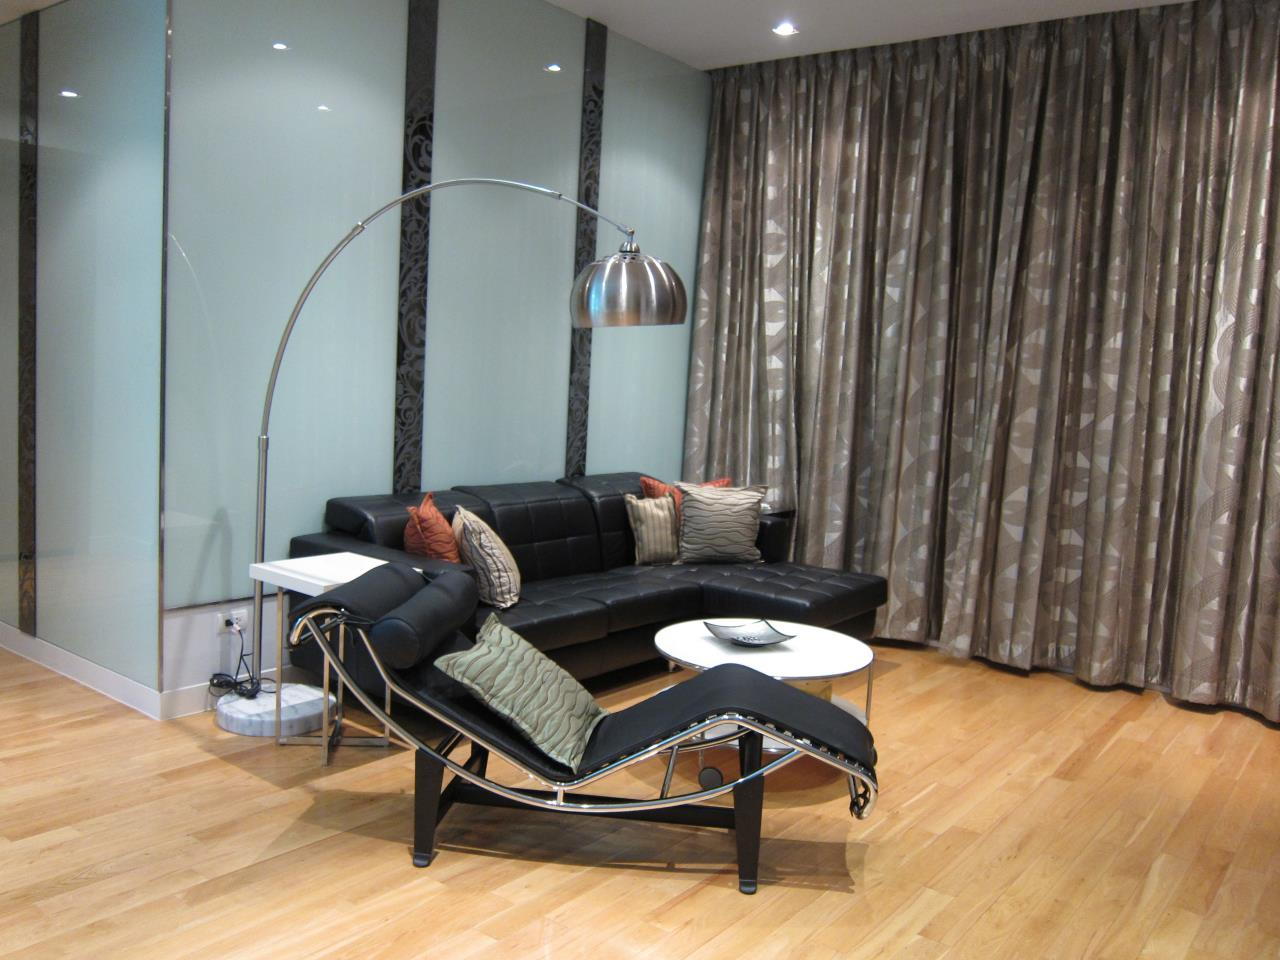 Piri Property Agency's 2 bedrooms Condominium  on tower B floor For Rent 2 2